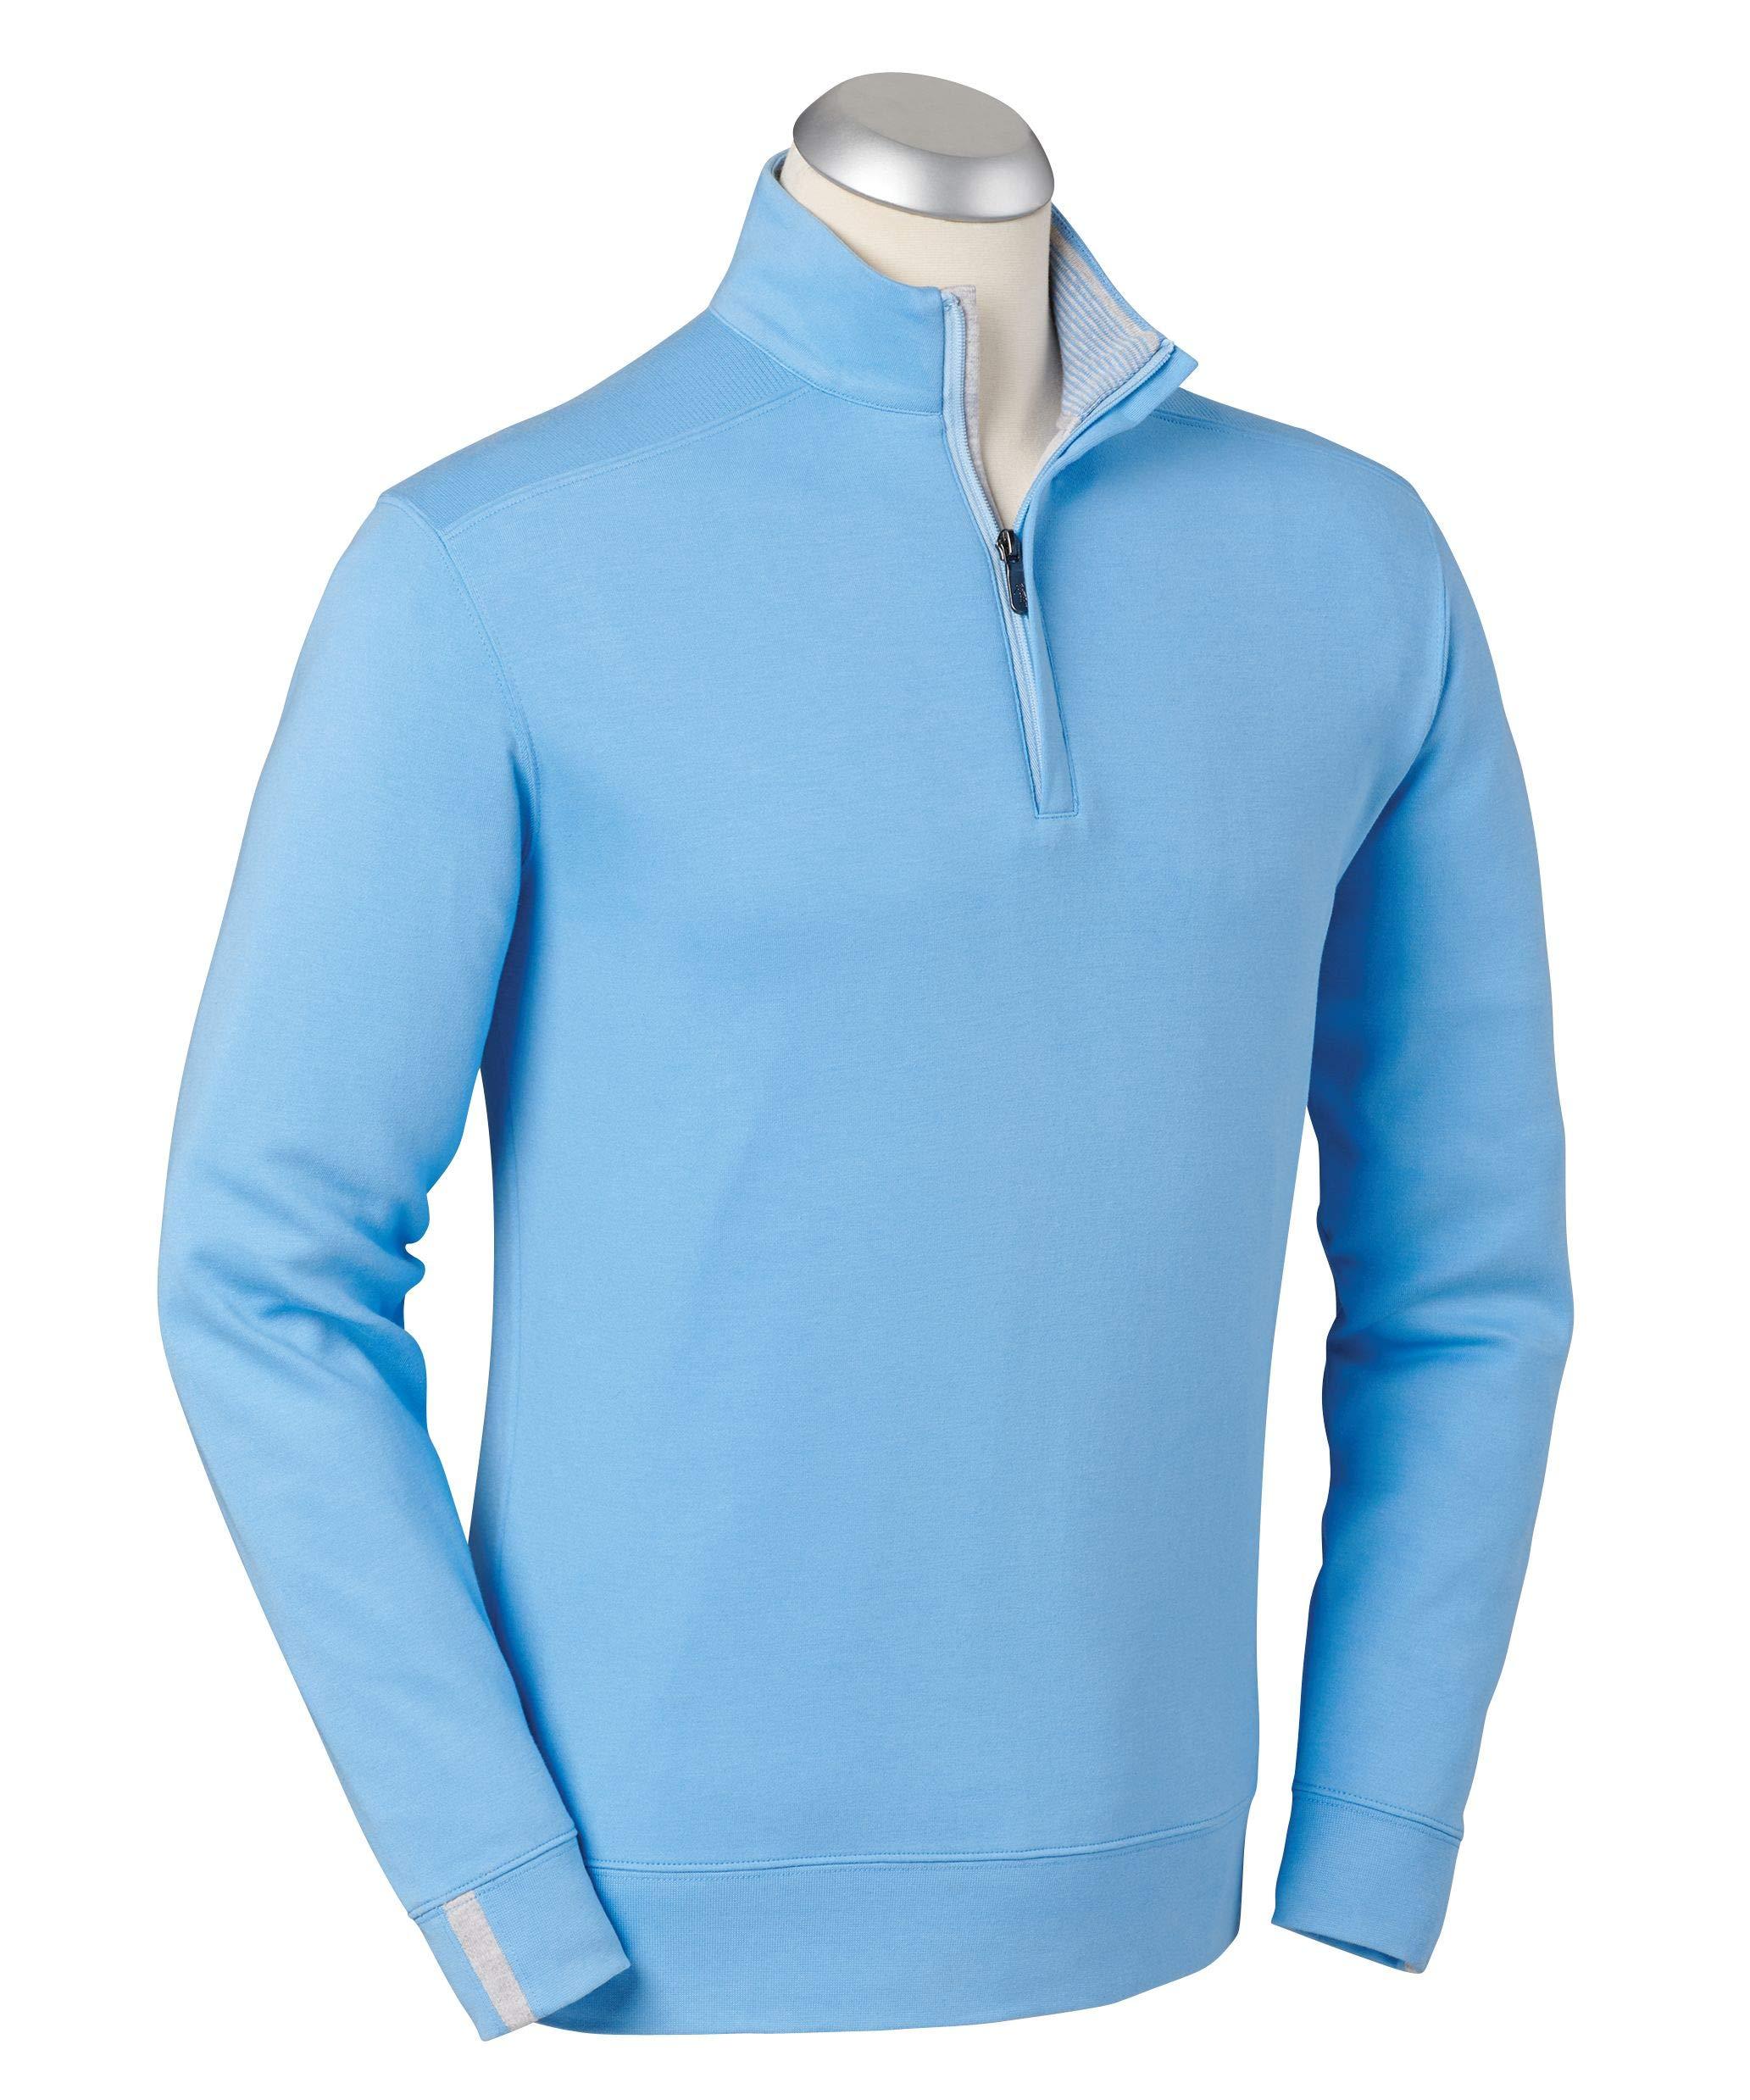 Bobby Jones Lux Pima Leaderboard Golf Pullover - Men's 1/4 Zip Pullover Golf Apparel Sky Blue by Bobby Jones